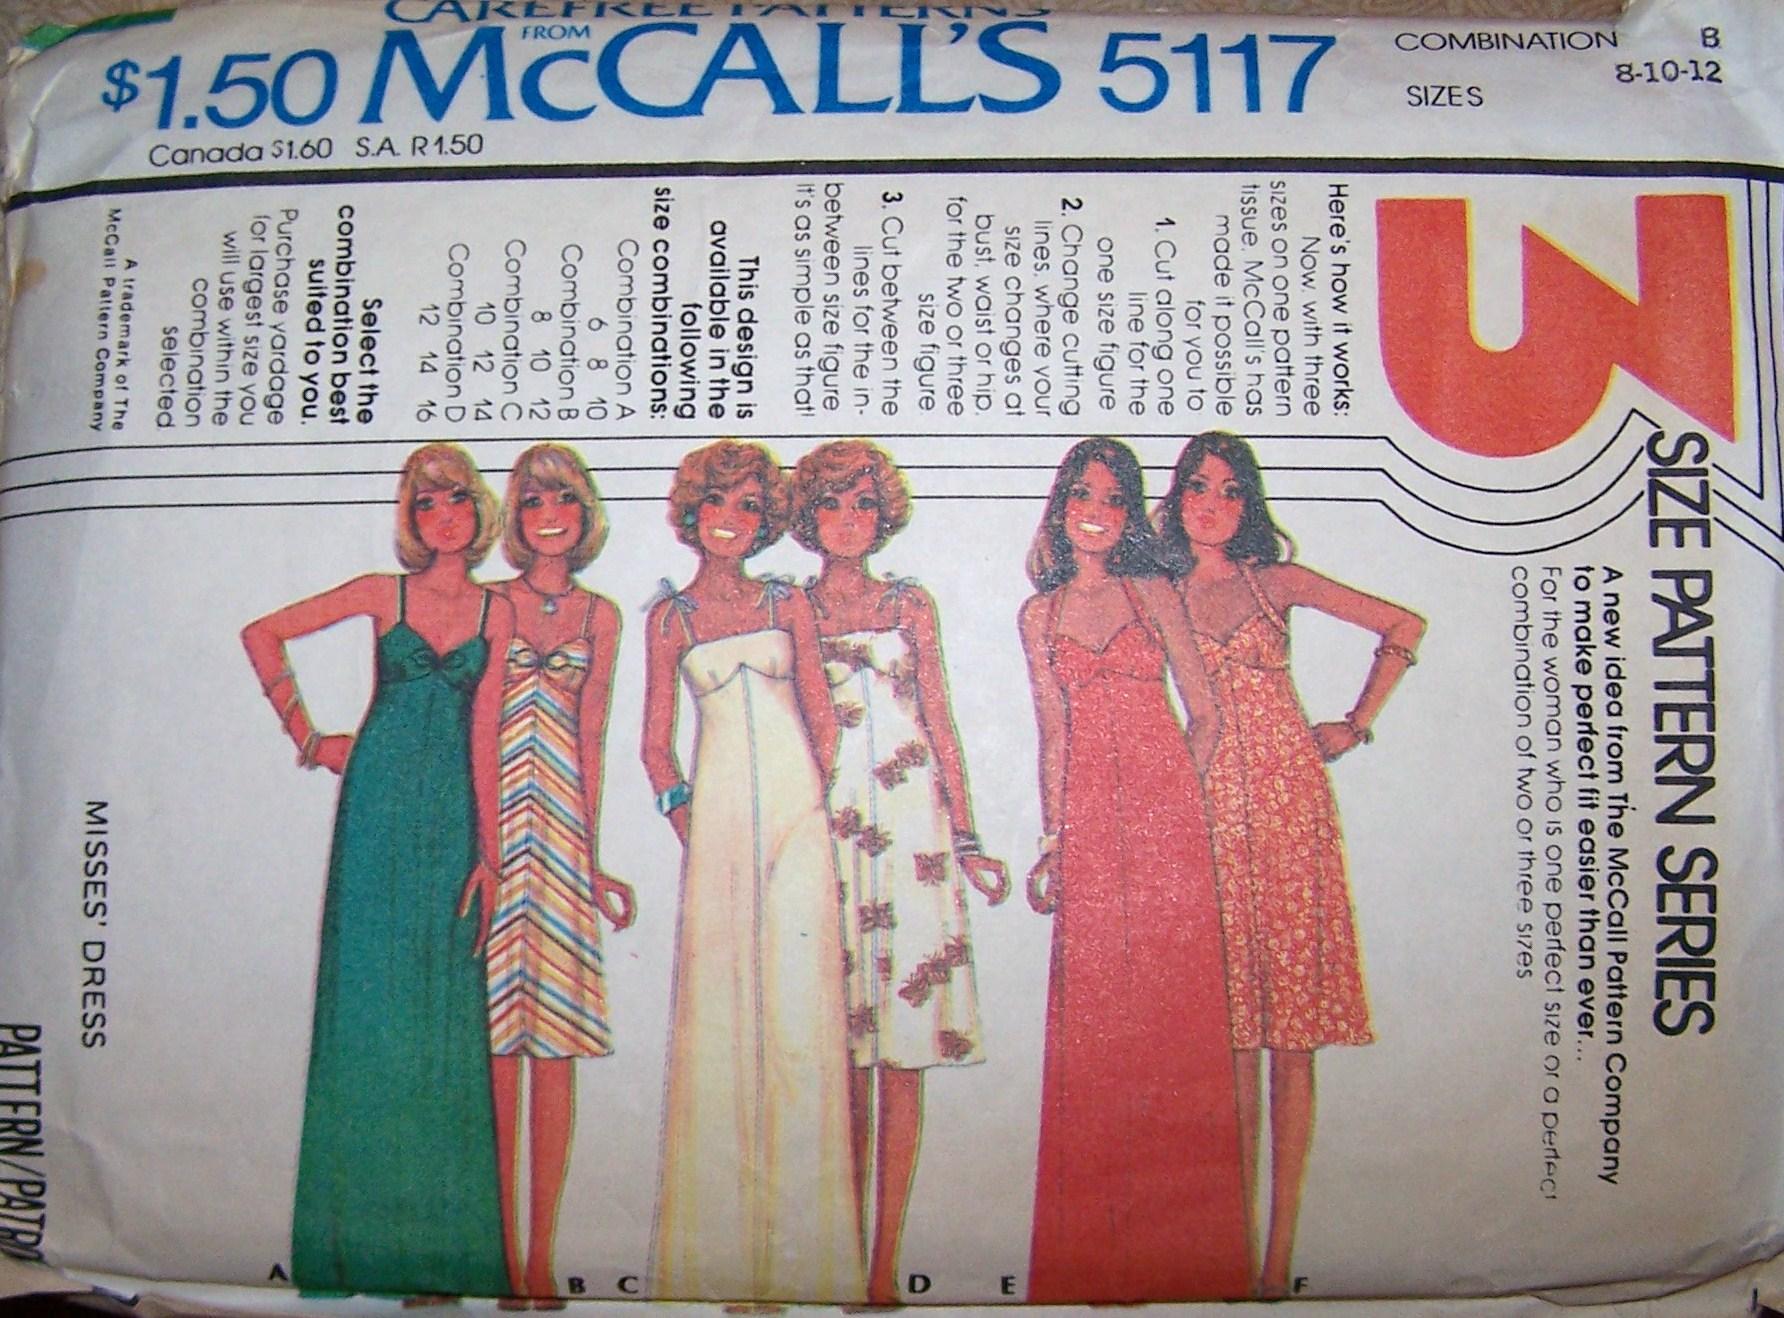 McCall's 5117